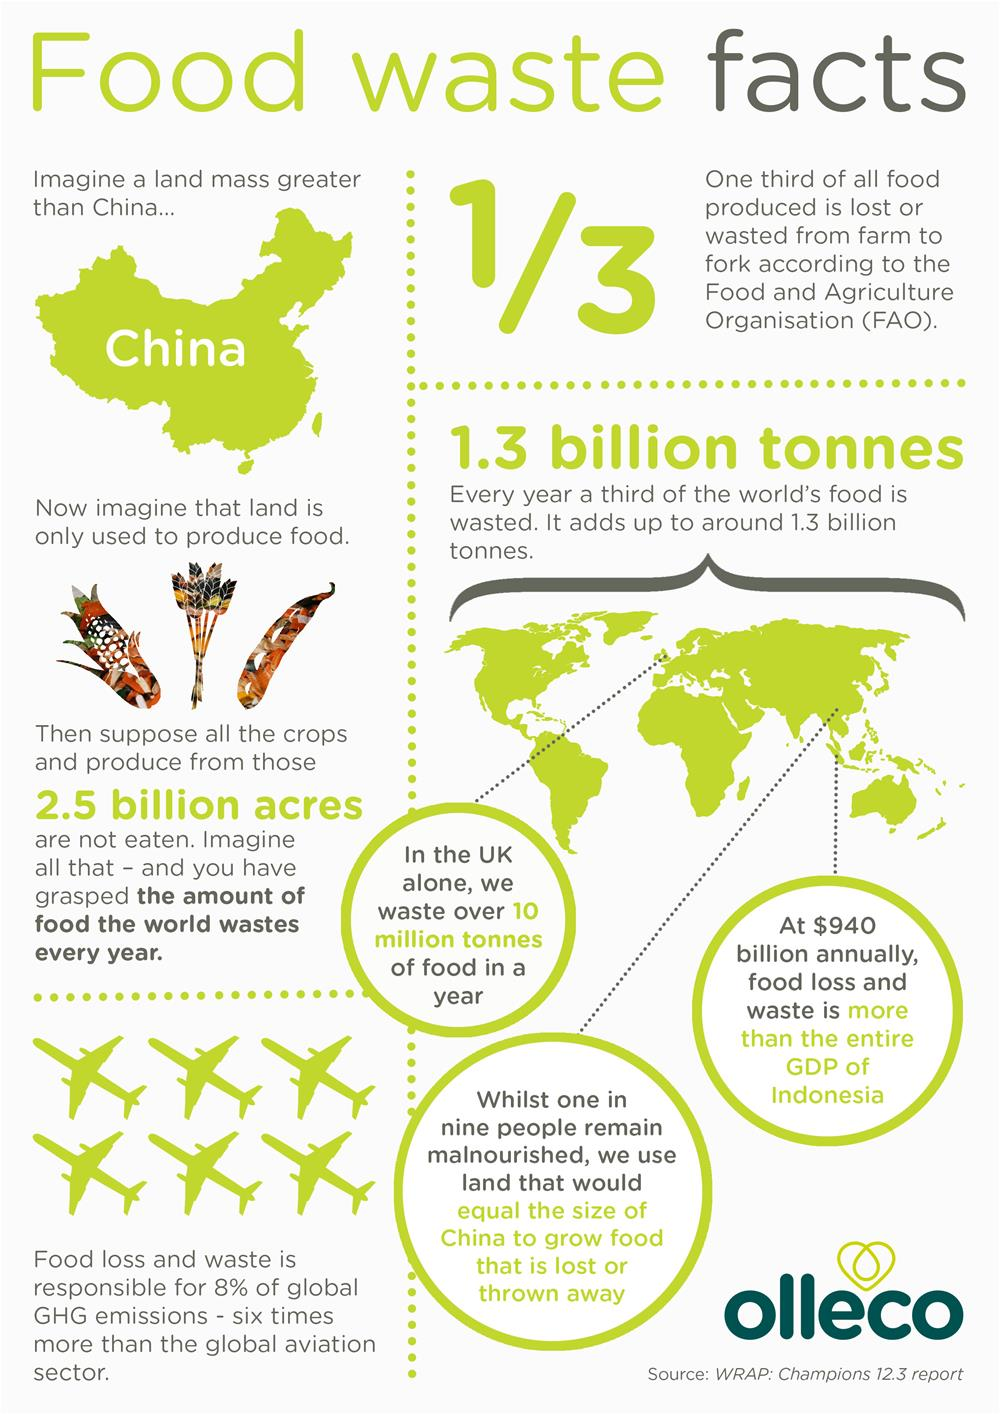 food-waste-facts-20172469ad6b85236d73ad4eff0000124192.jpg